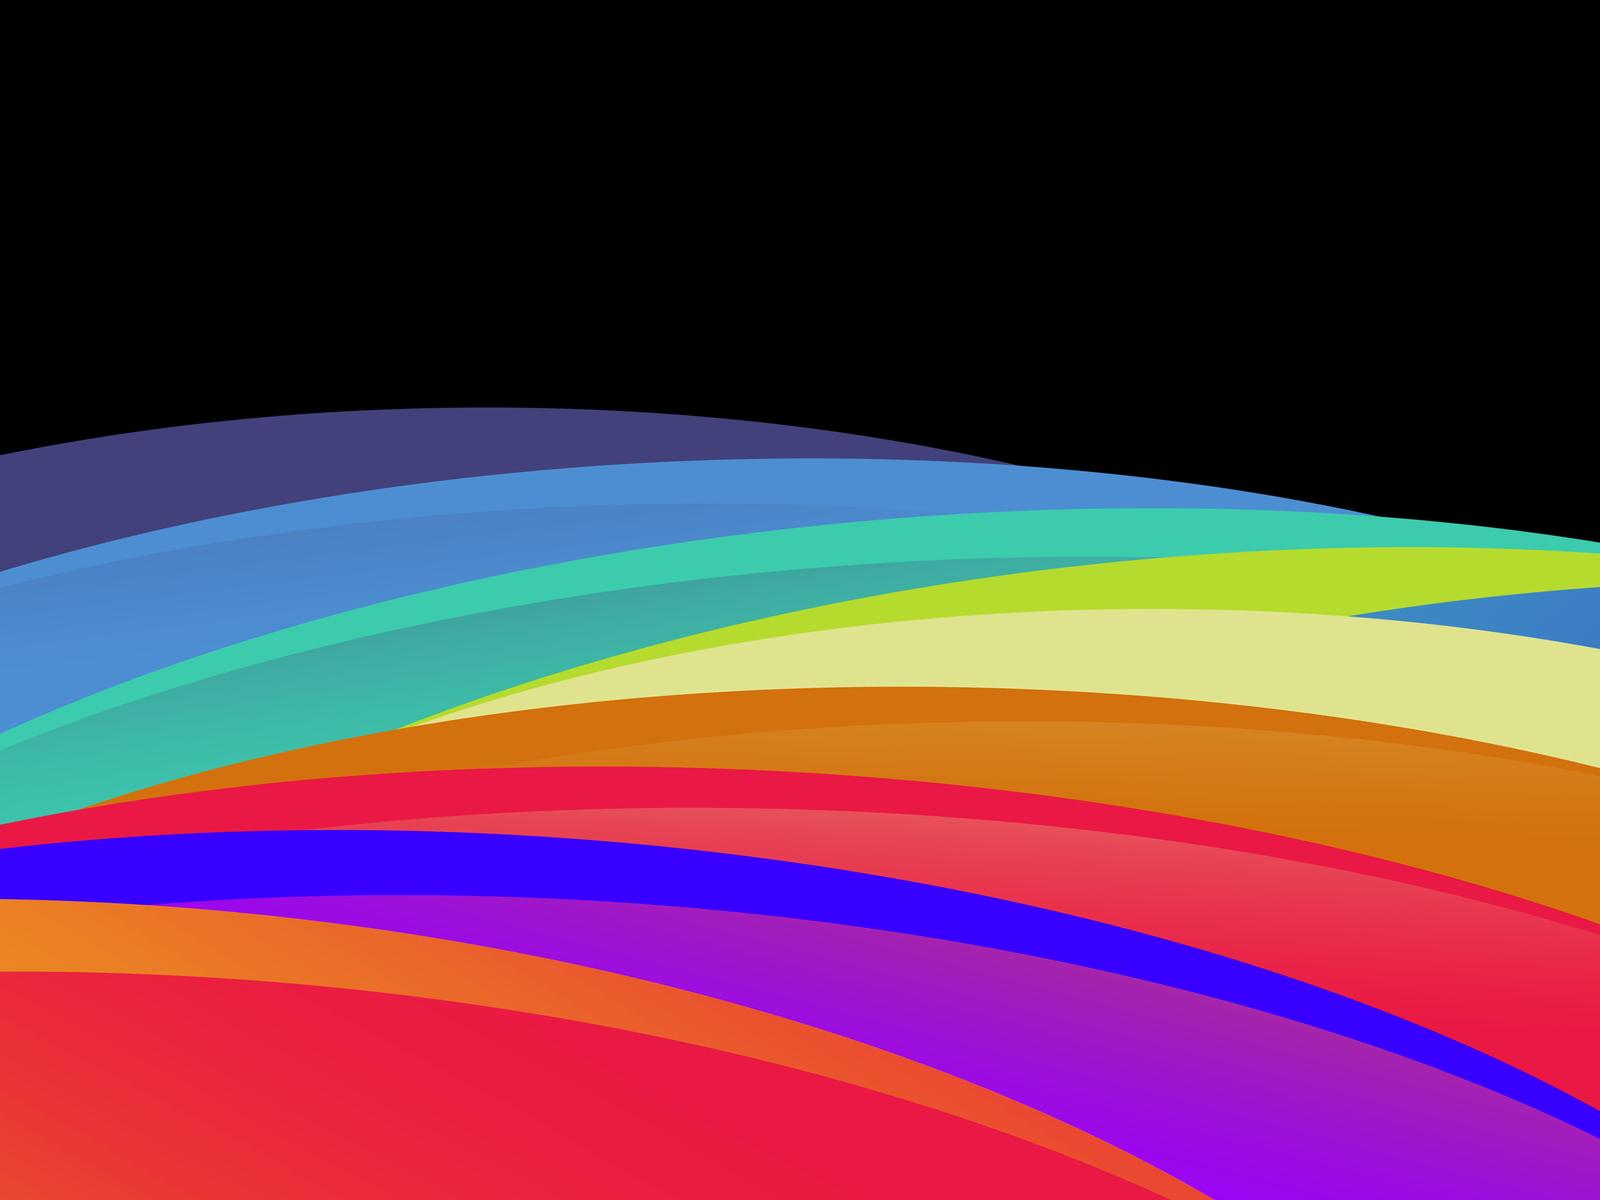 dark-color-waves-abstract-4k-pa.jpg